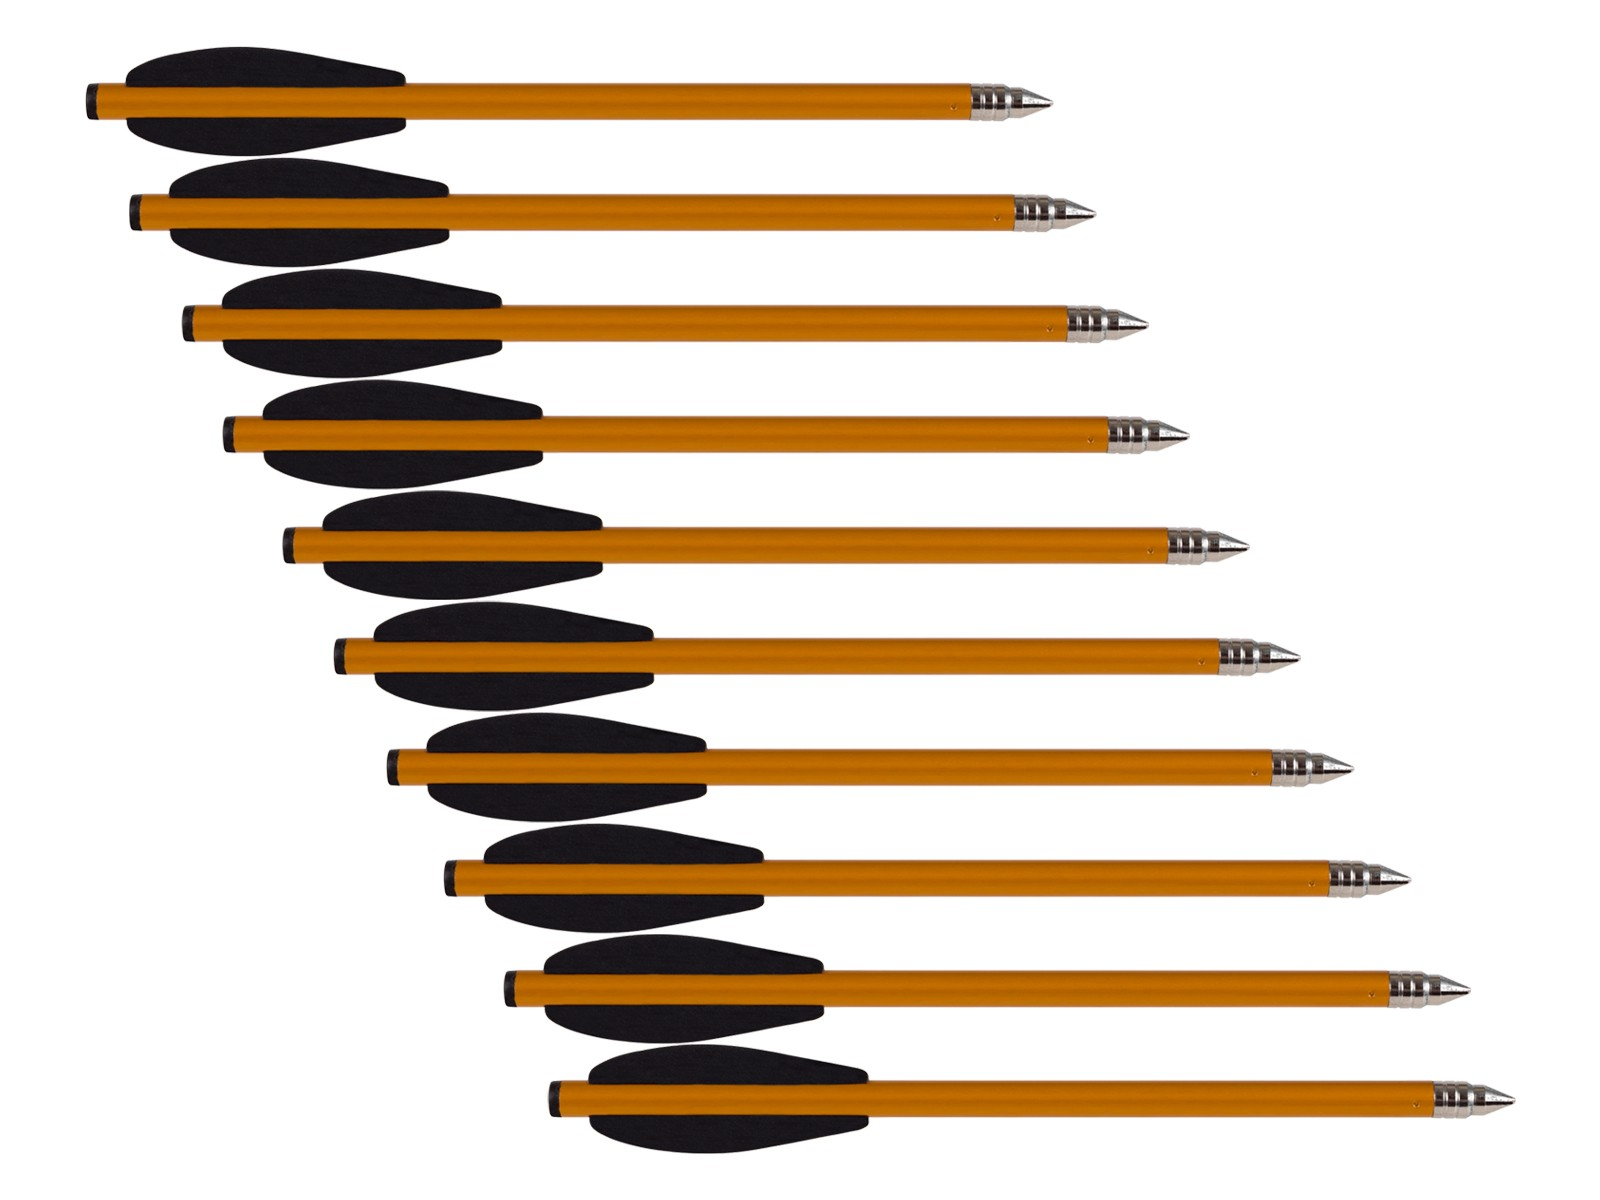 Sen-X Target Arrows by Steambow